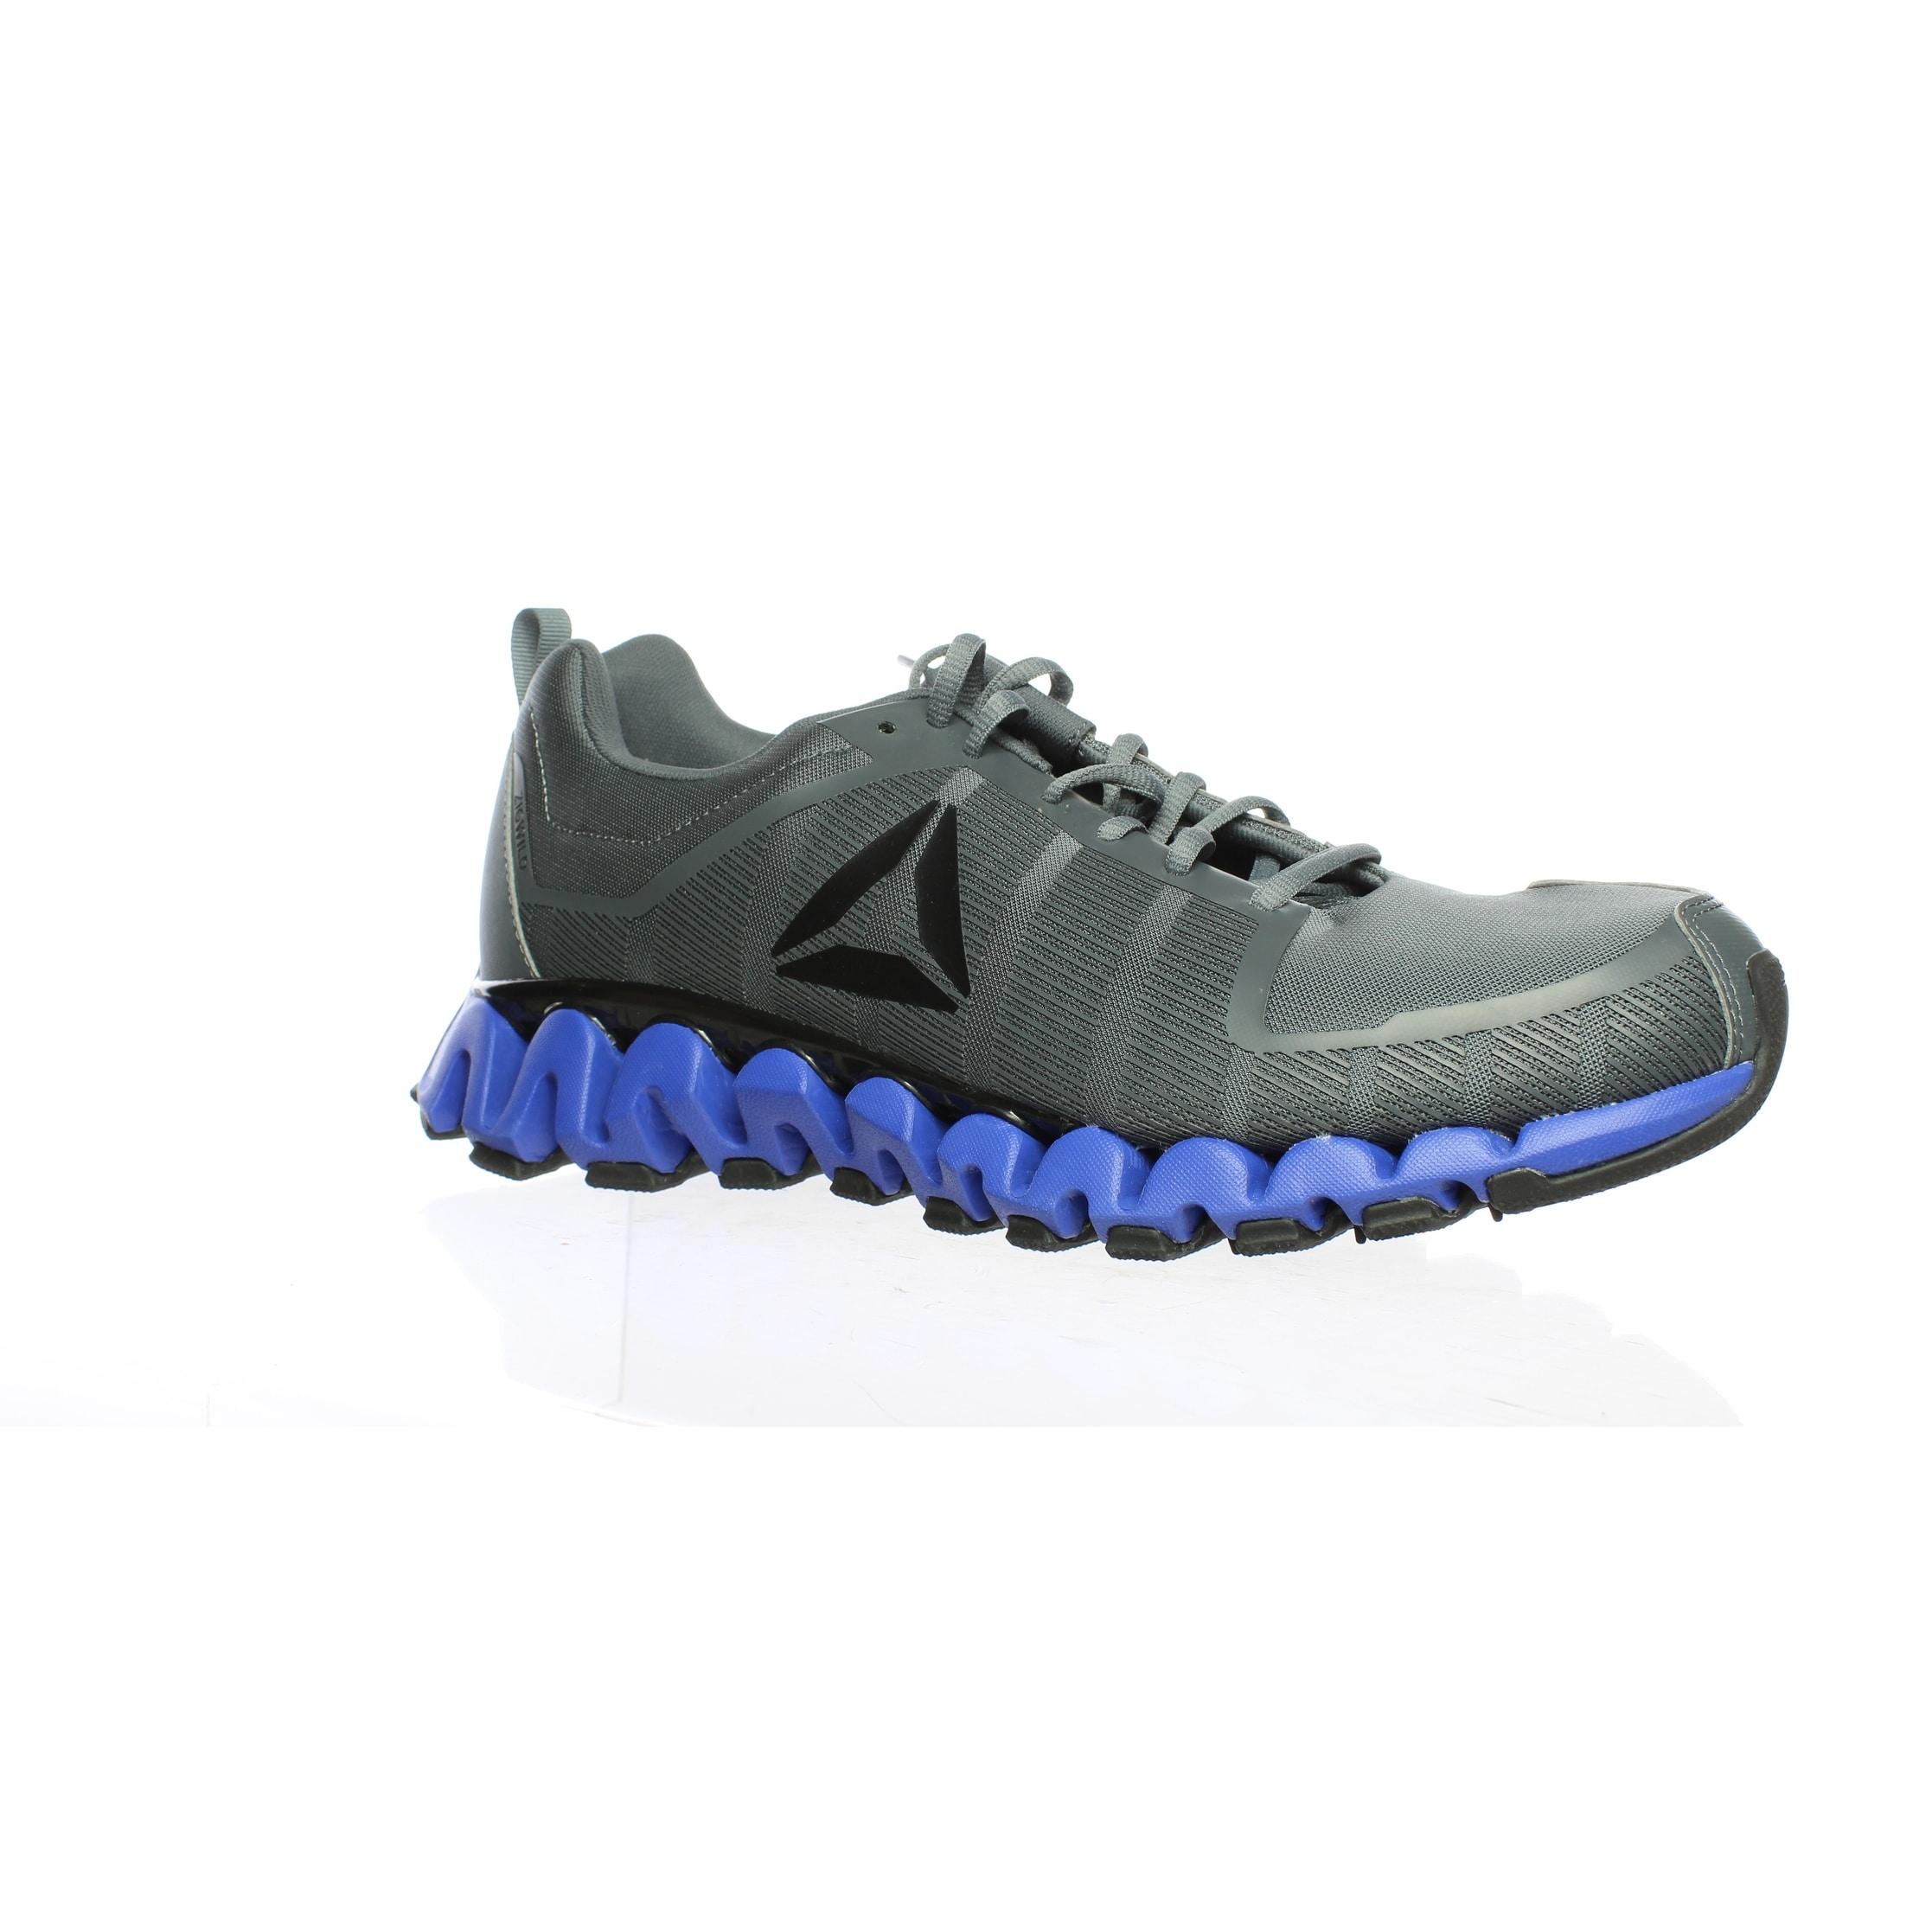 Reebok Womens Zigwild Tr 5.0 Gray Running Shoes Size 13